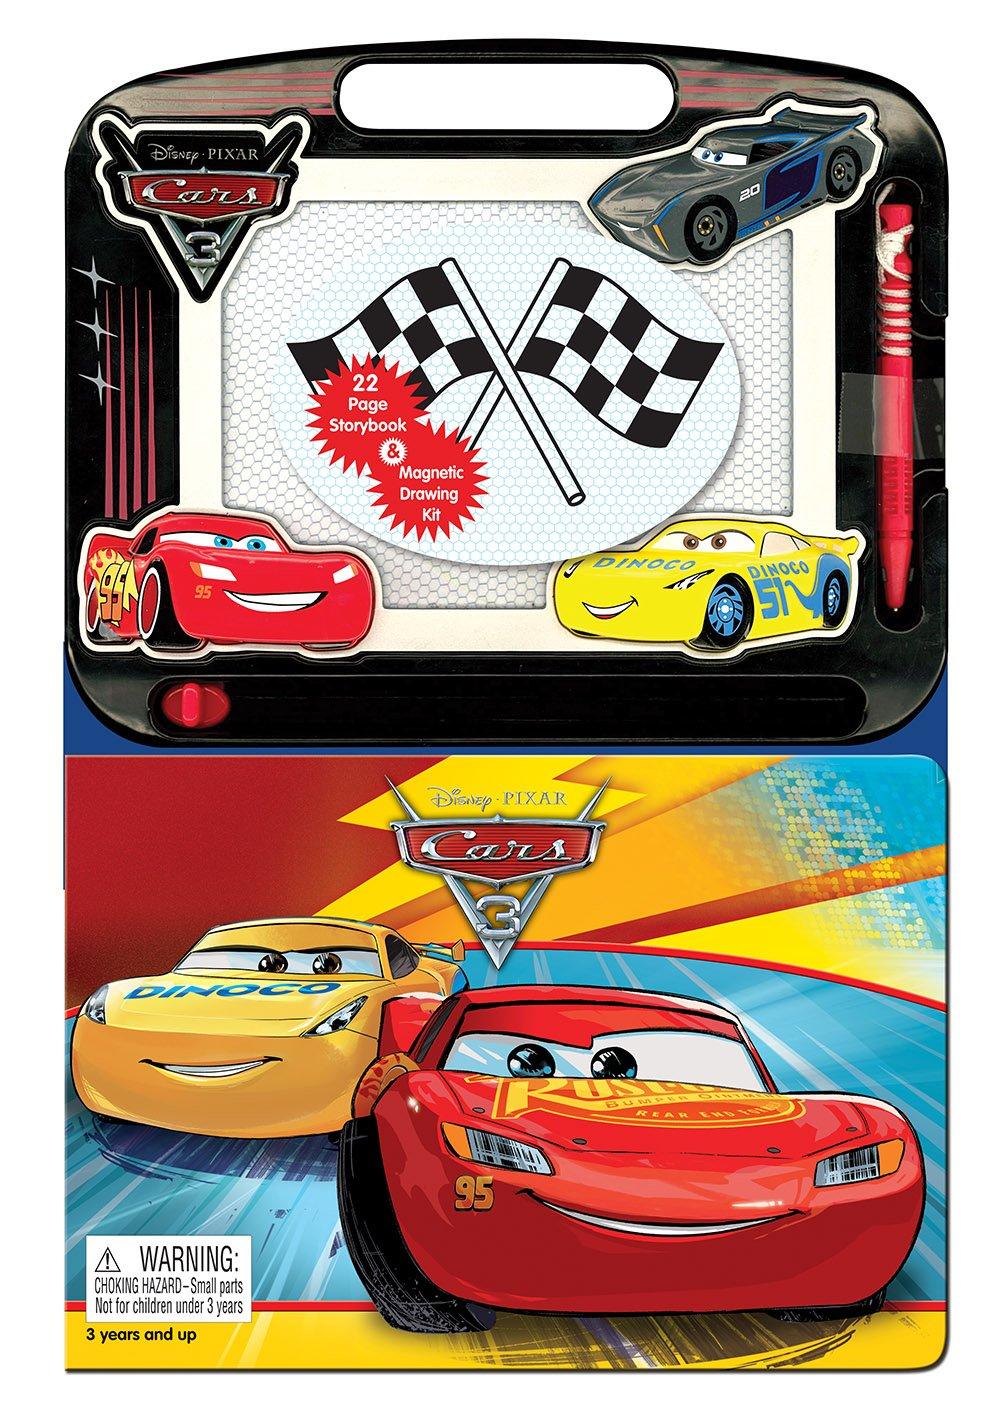 Disney Pixar Cars 3 Learning Series Phidal Publishing Inc